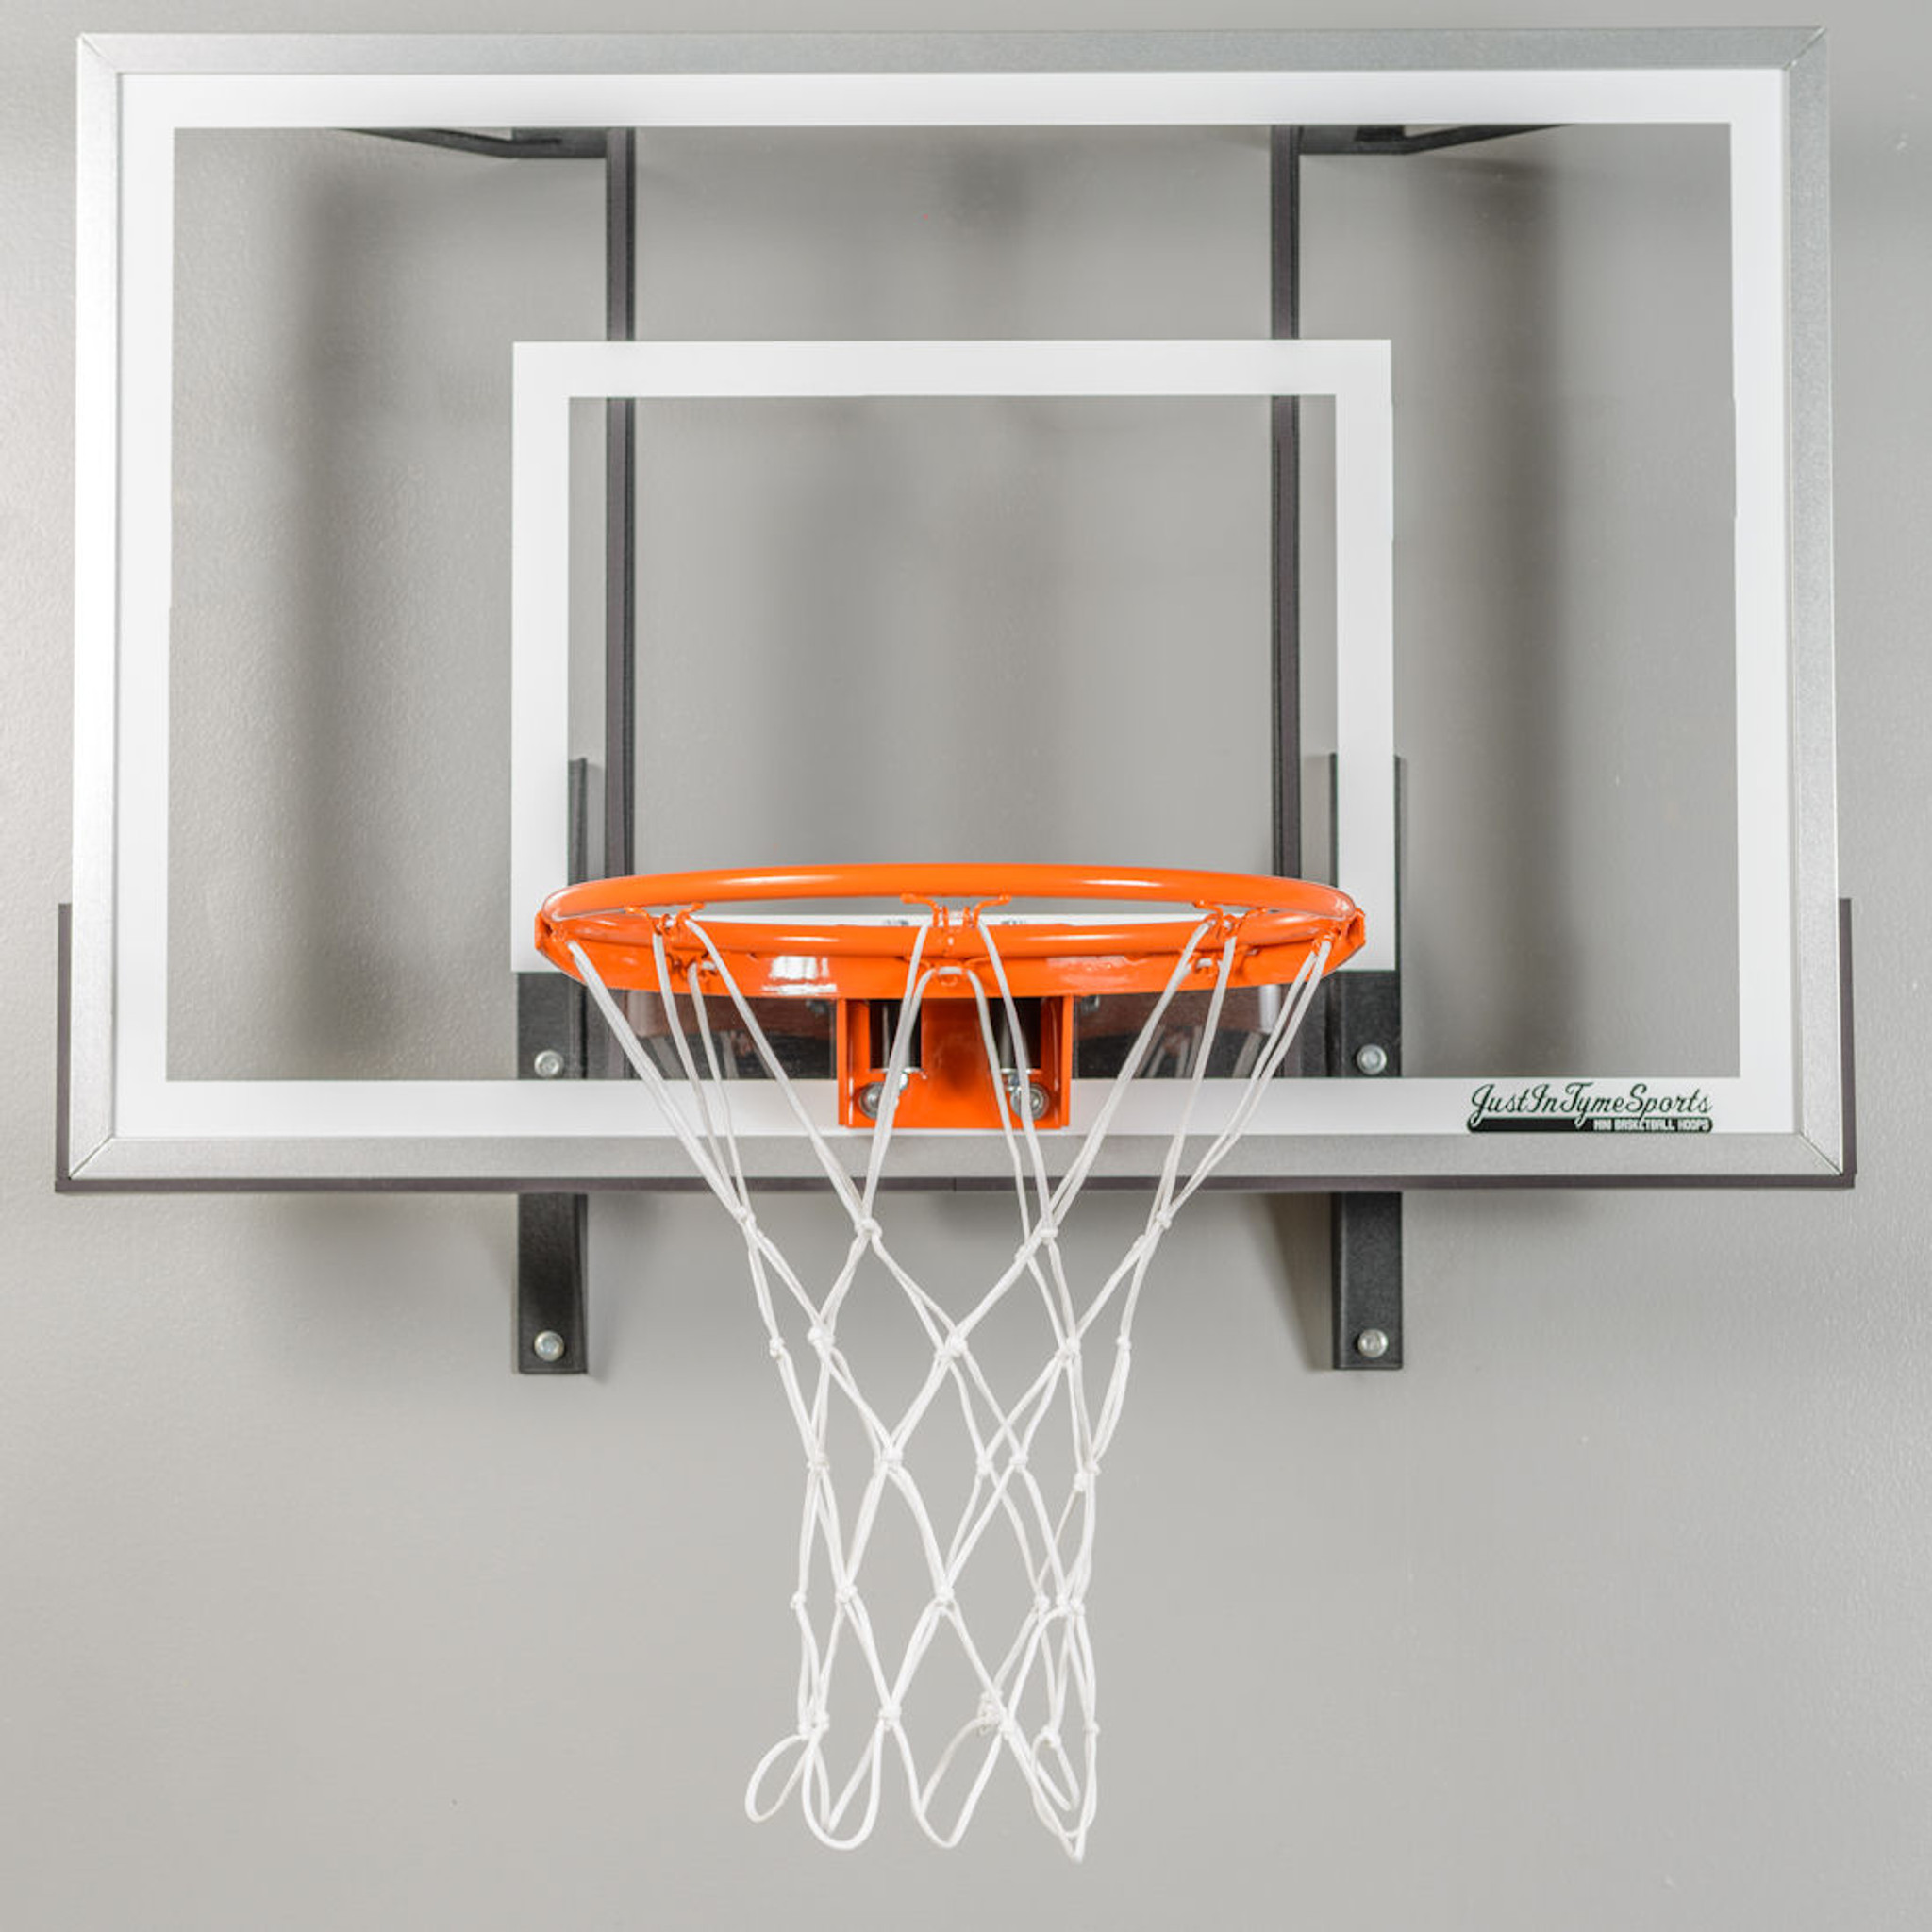 Mini Pro Ultimate Basketball Hoop Set - JustInTymeSports